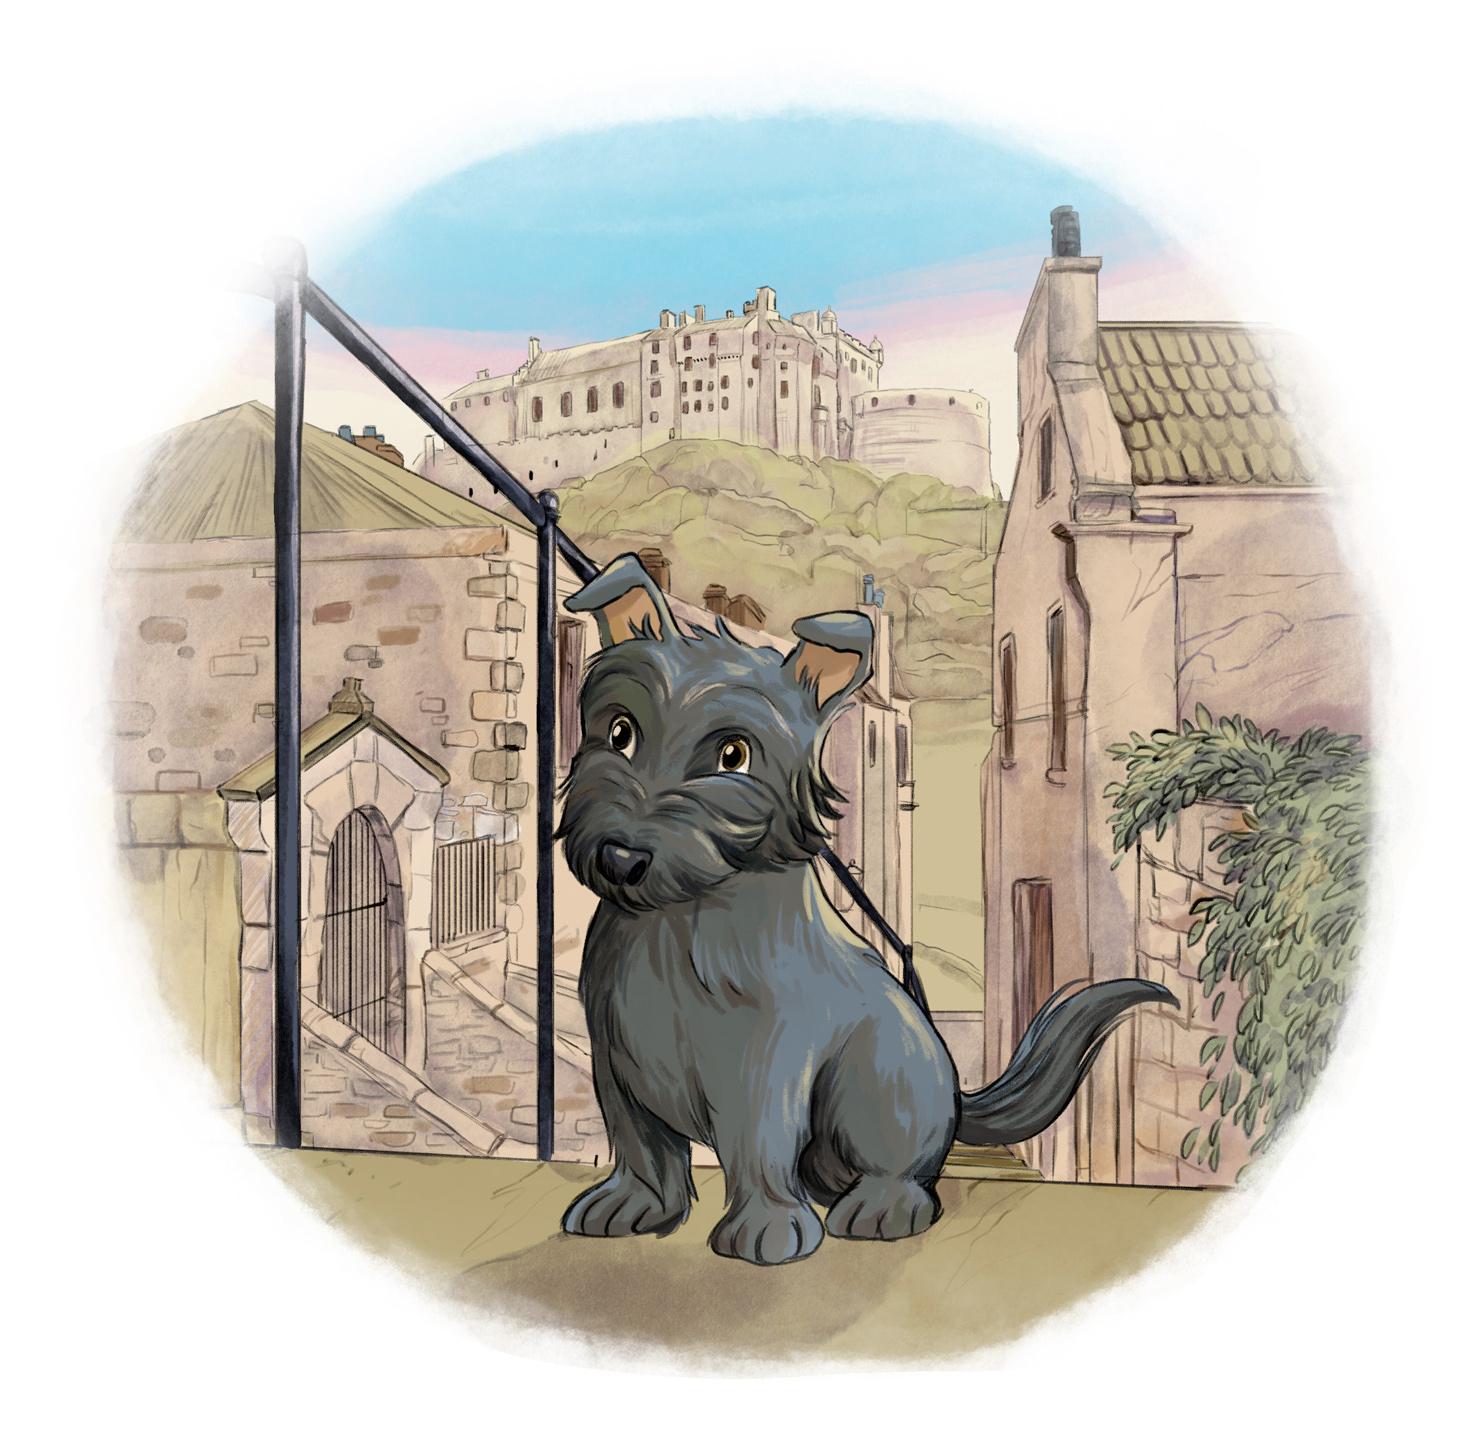 bobby the dog and the castle of Edimburgh